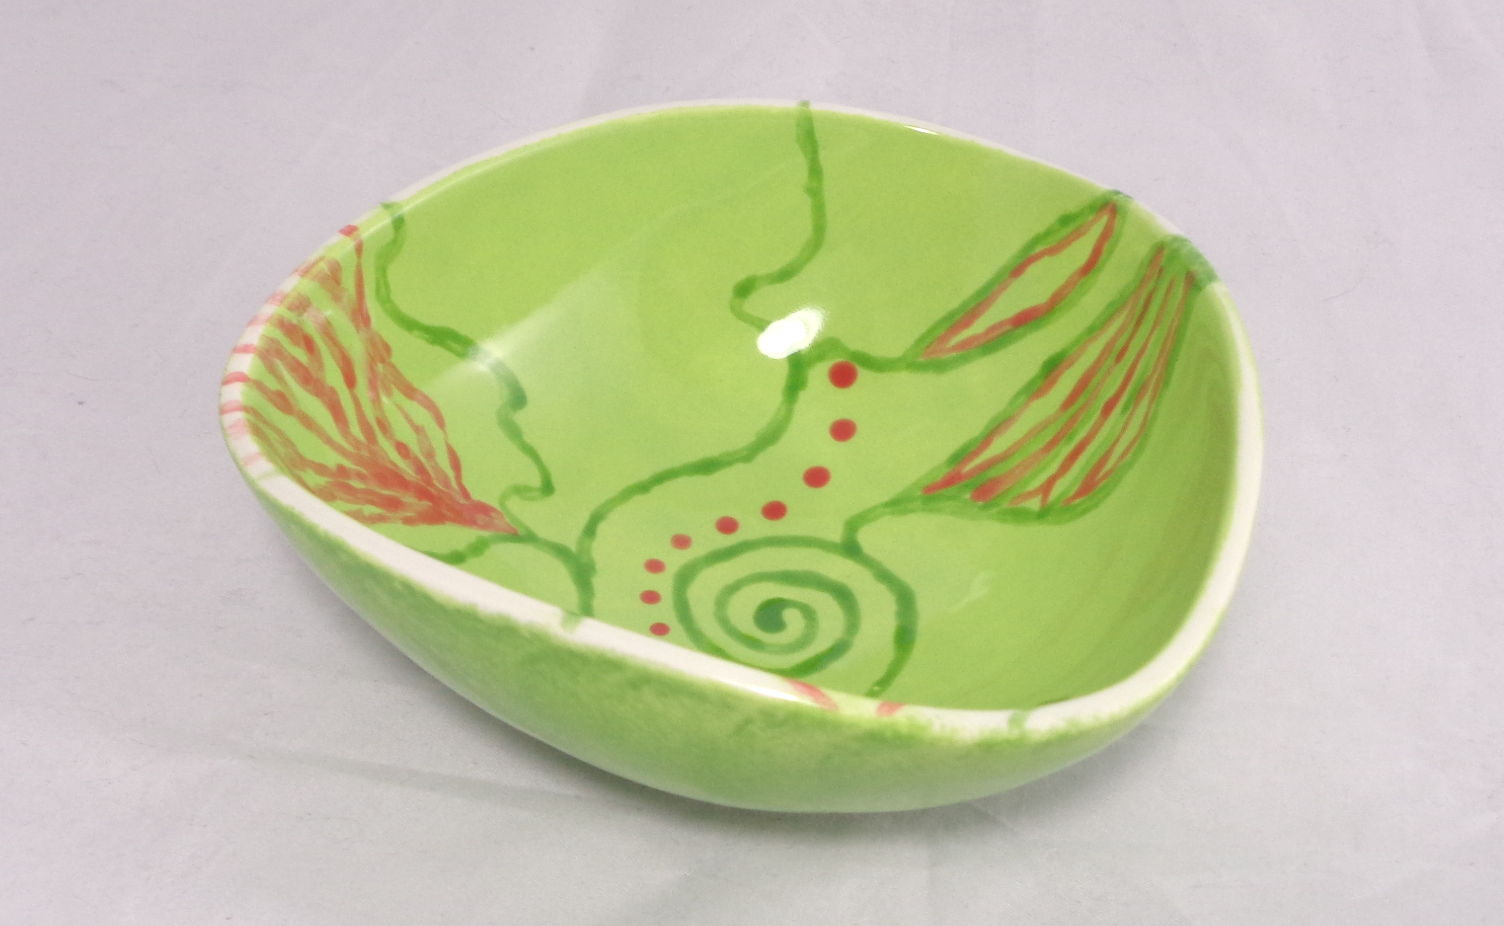 Bemalte Keramik green nature - dreieckig